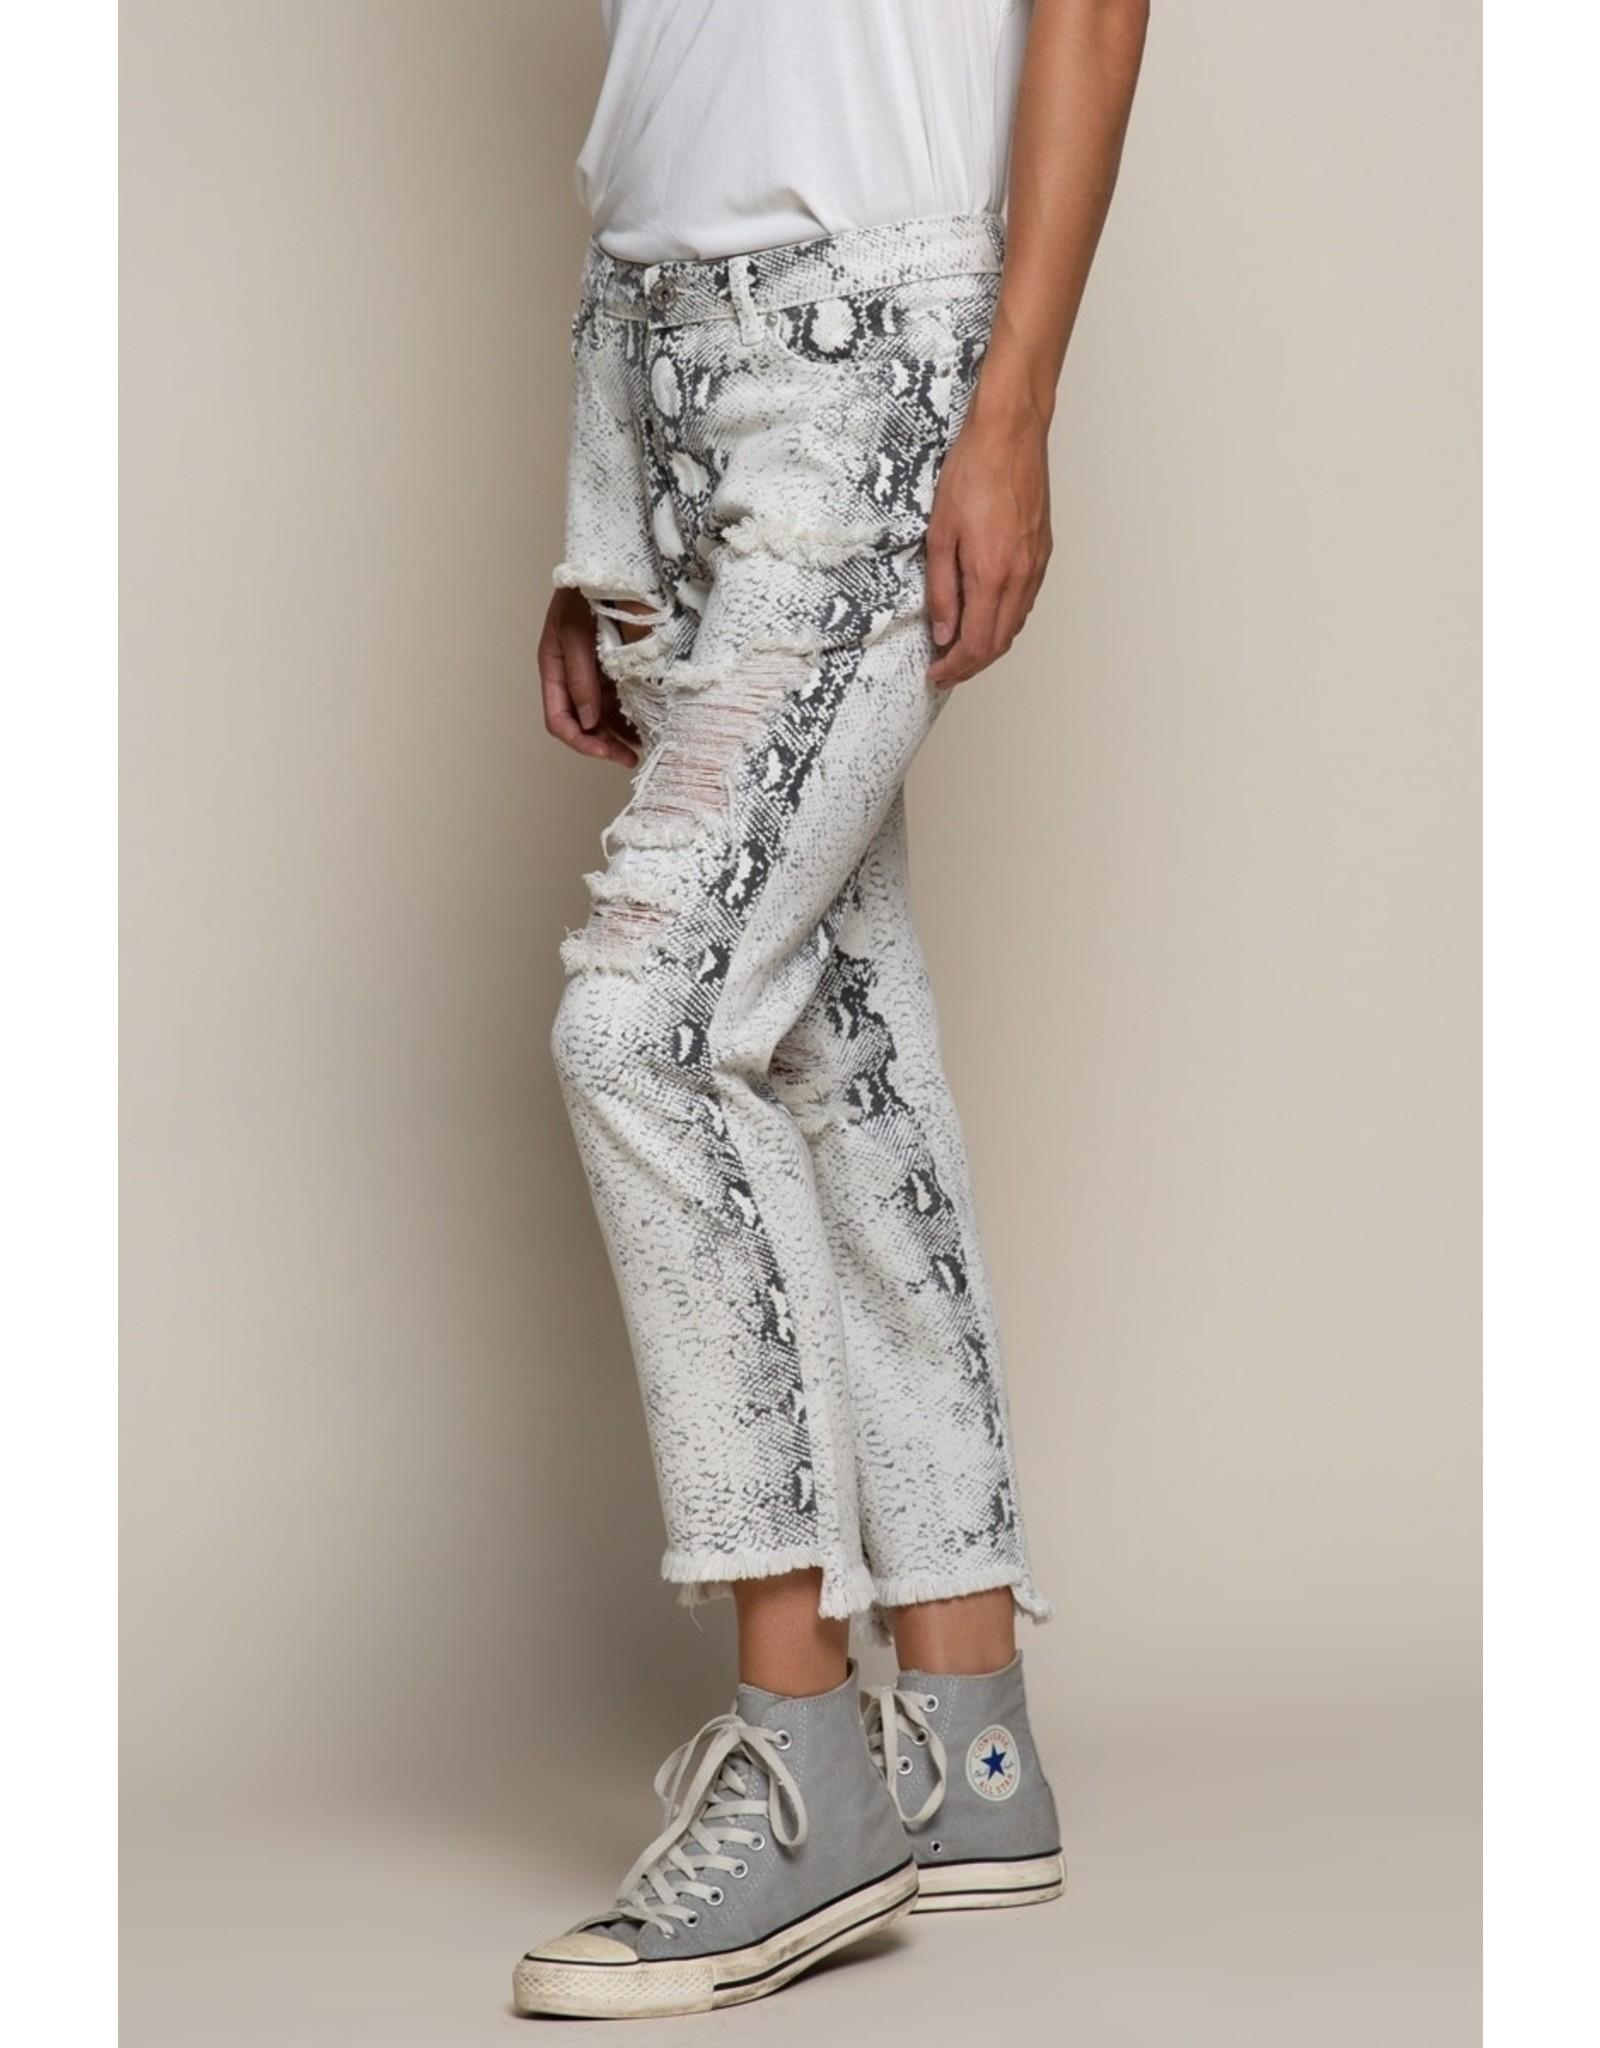 Distressed Snake Skin Jeans - White